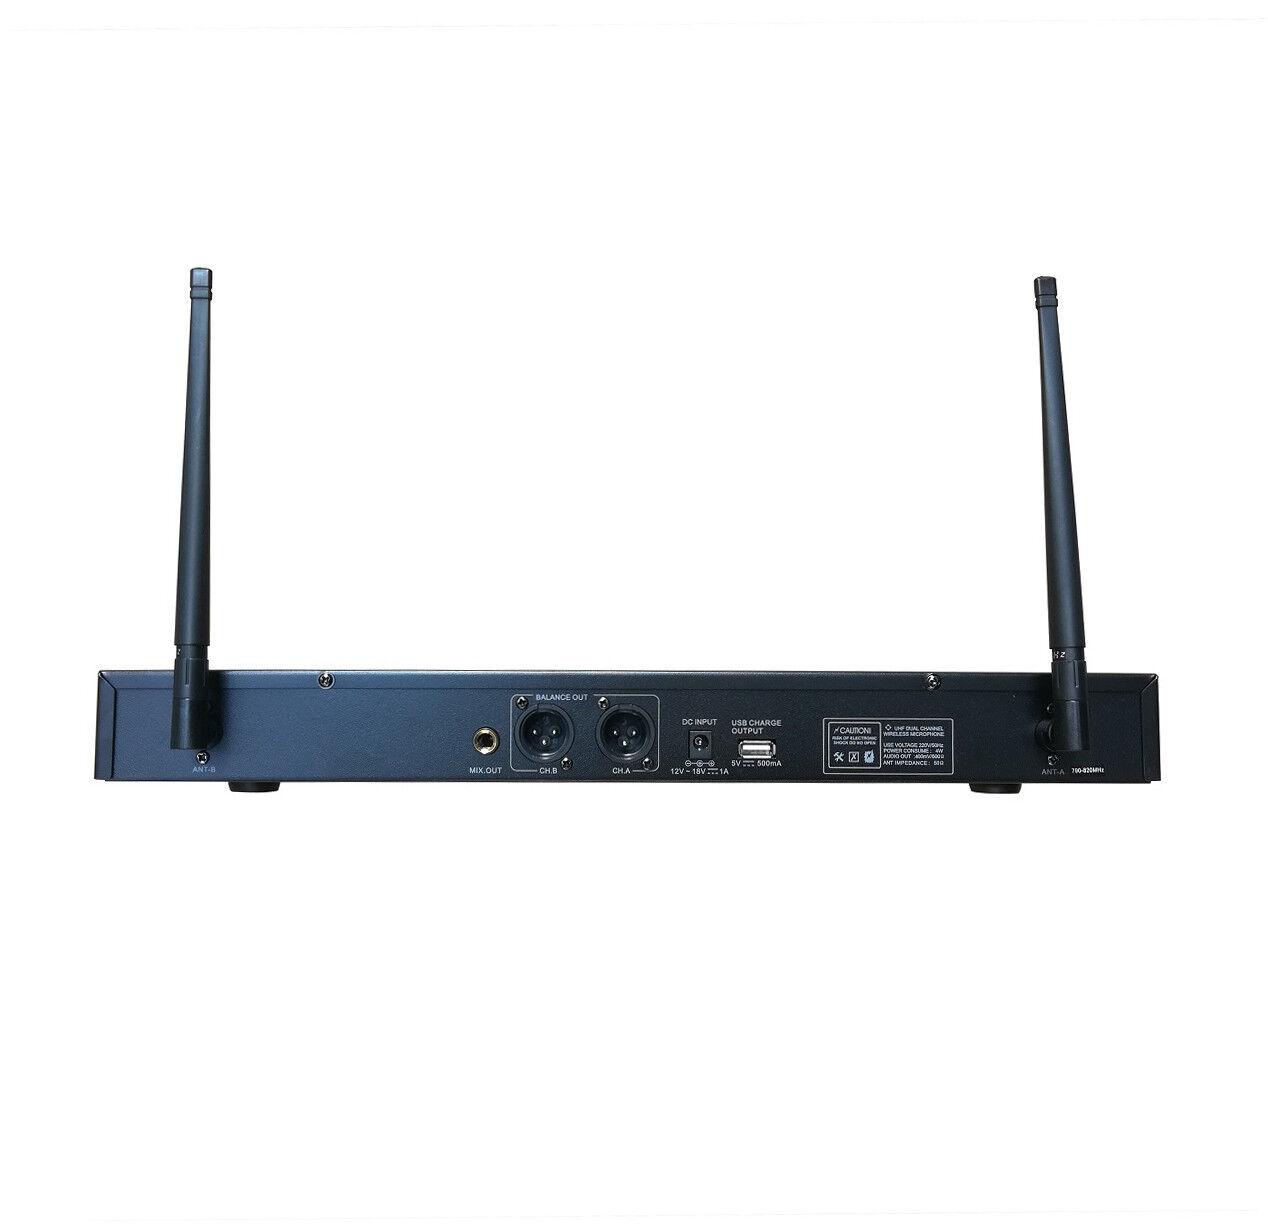 Sistema de micrófono micrófono micrófono inalámbrico UHF recargable para la presentación de Karaoke 2 de mano 4d79d1